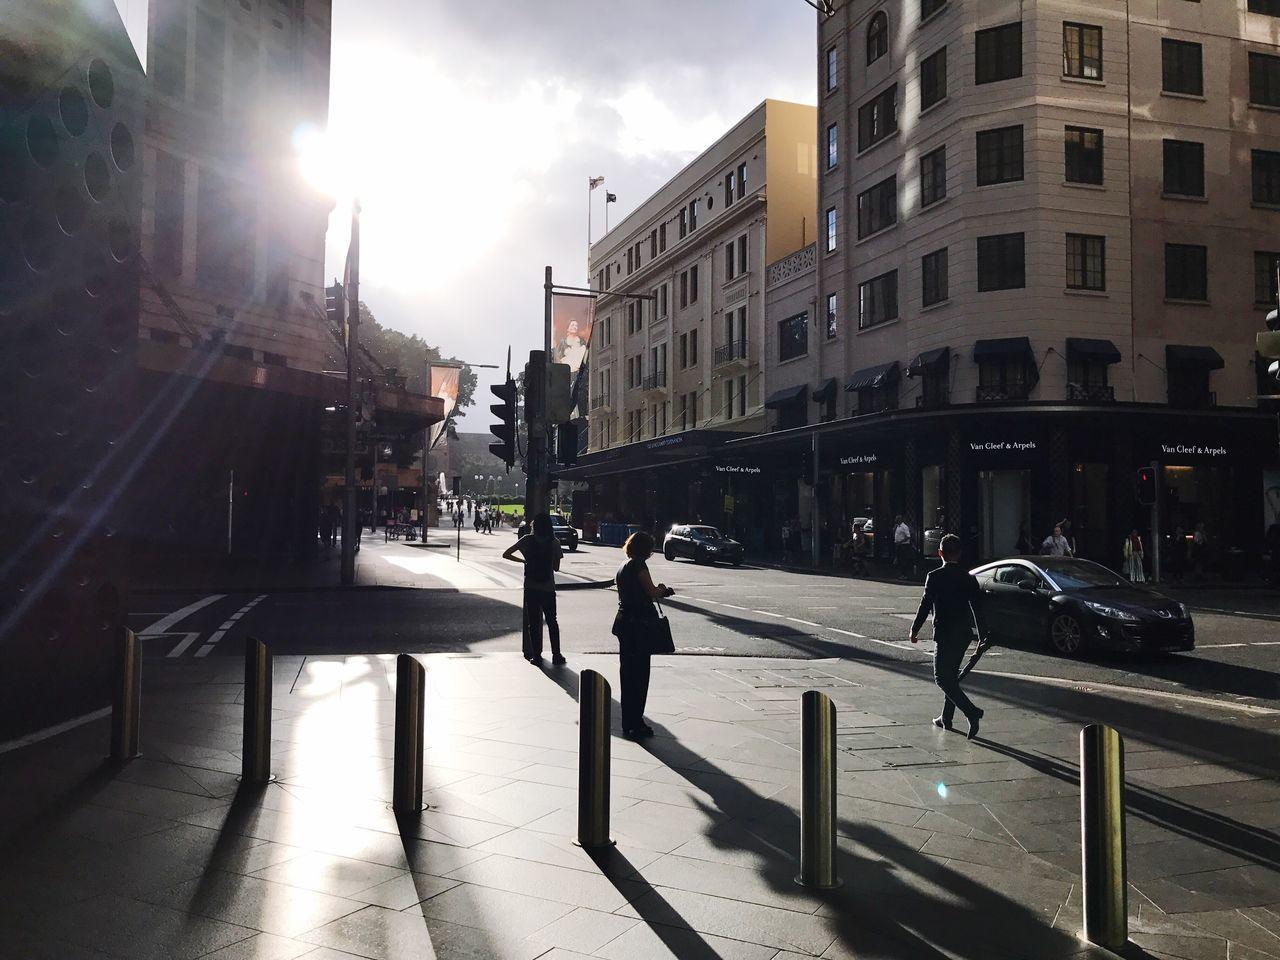 Morning Light & Sun Rays Through The Clouds | The City Light